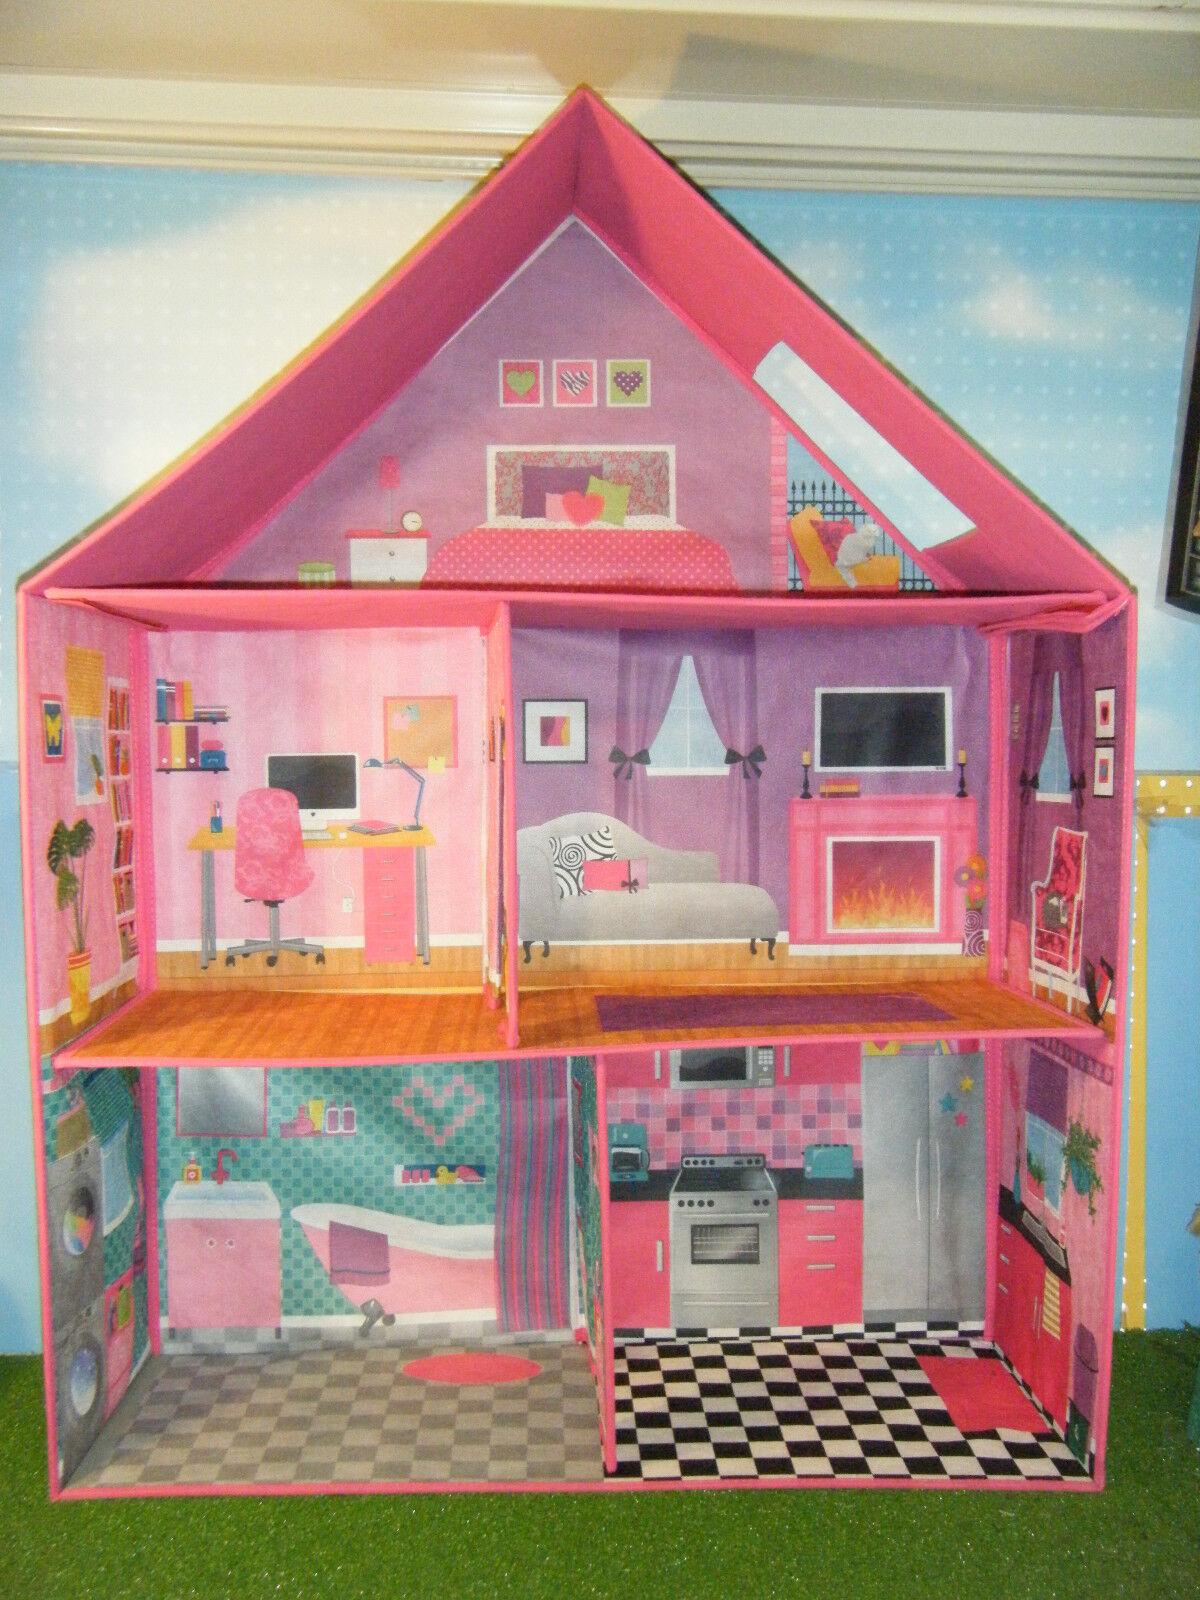 Calego 3D Imagination Kitchenette Playcenter